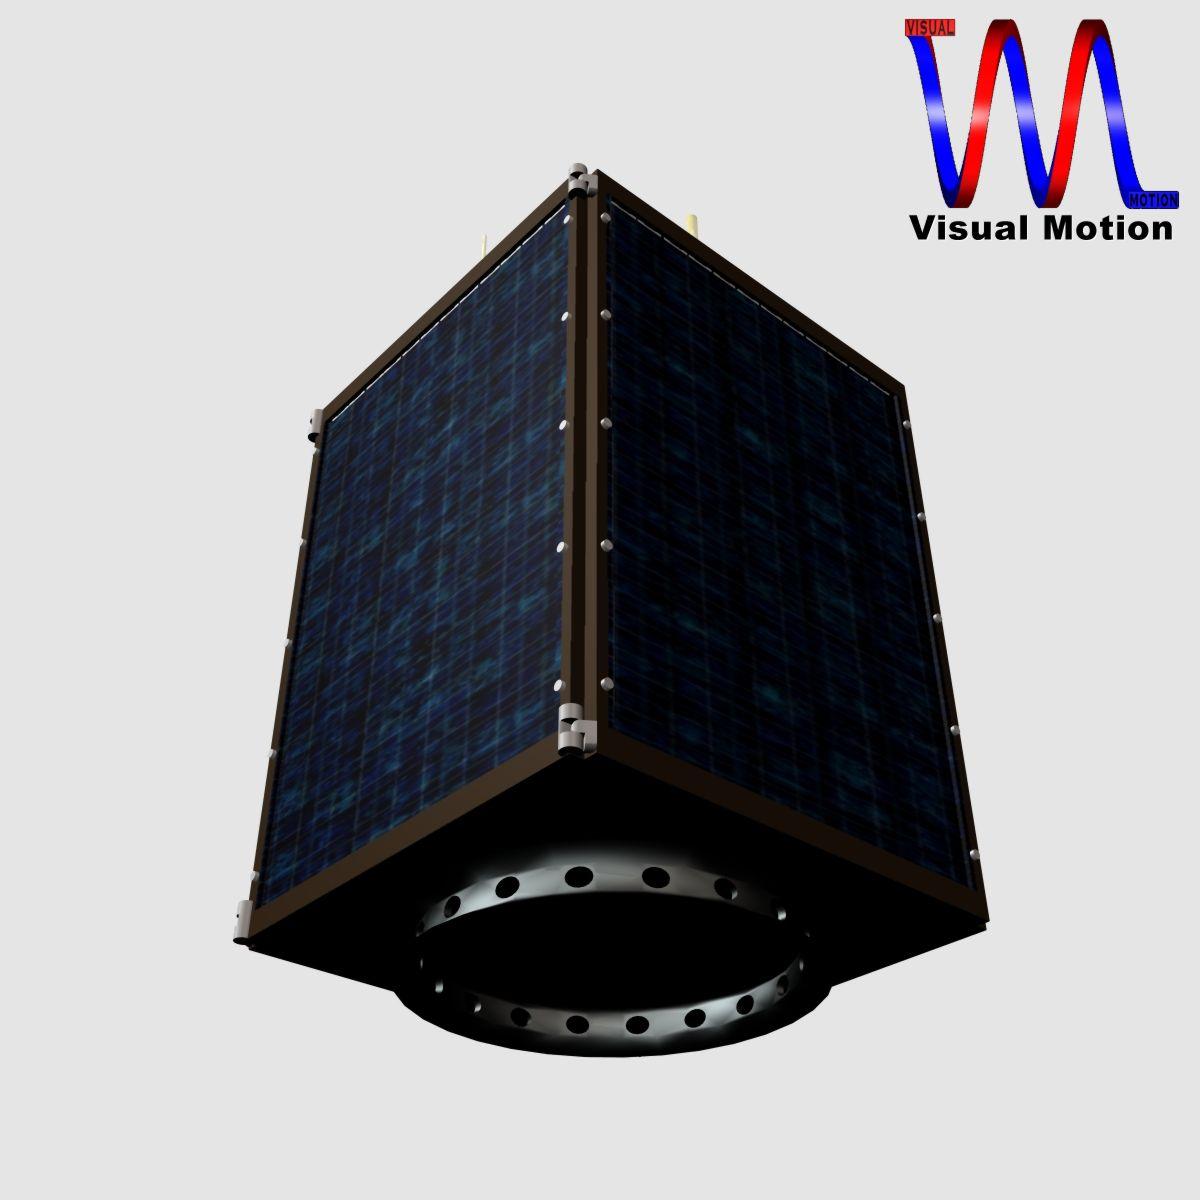 dprk kwangmyongsong-3 satellite 3d model 3ds dxf cob x obj 134456